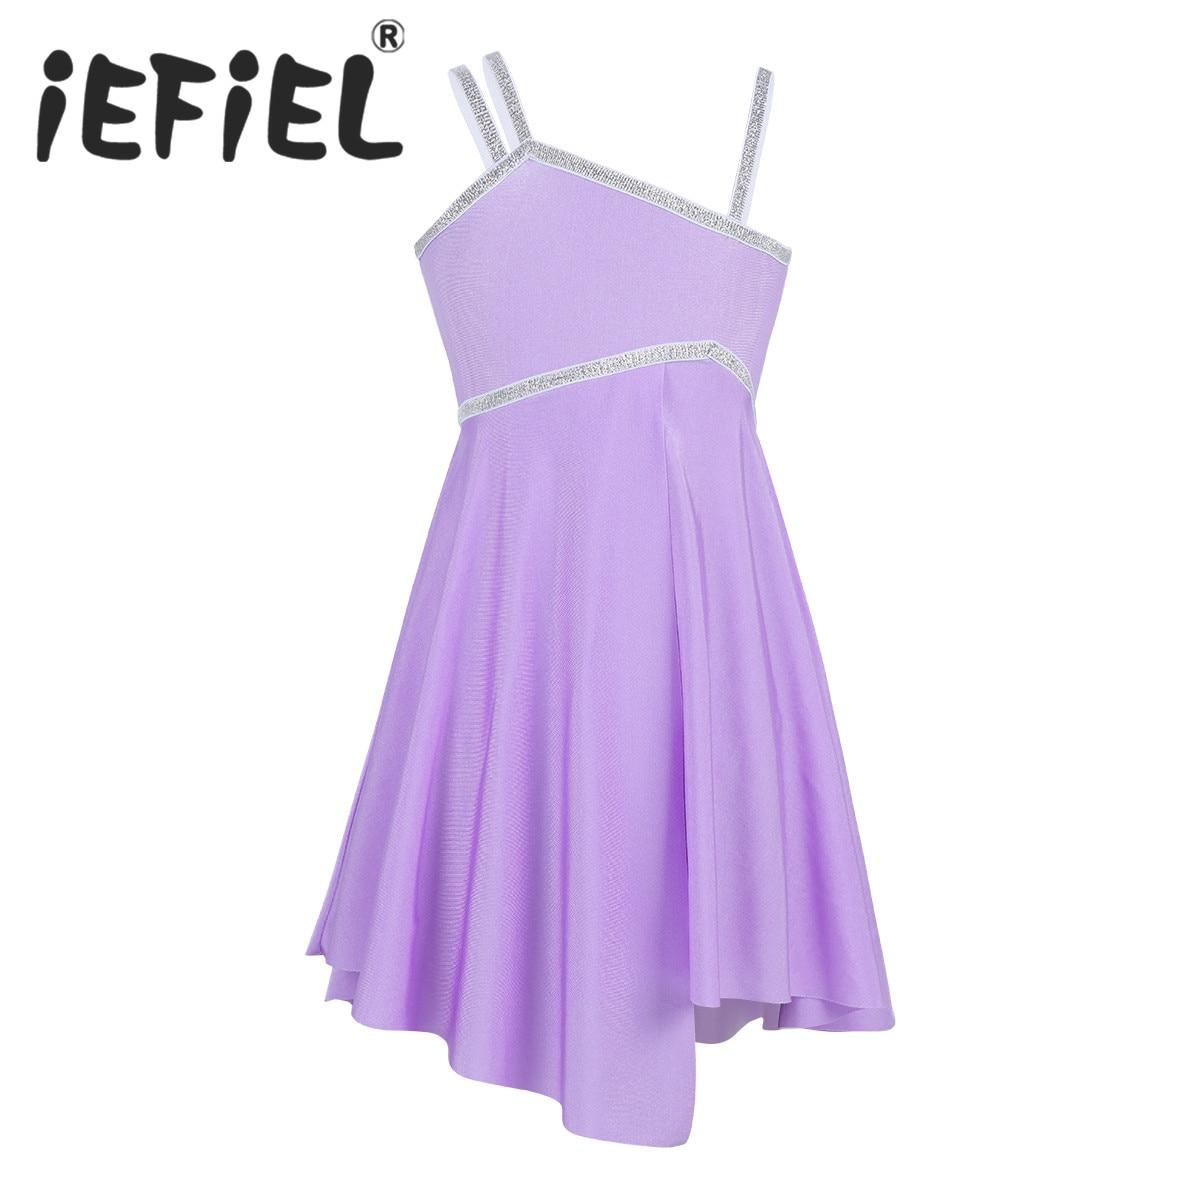 iEFiEL Cute Kids Girls Asymmetrical Shoulder Shiny Ballet Dance Gymnastics Leotard Dress Latin Jazz  Stage Performance Costume